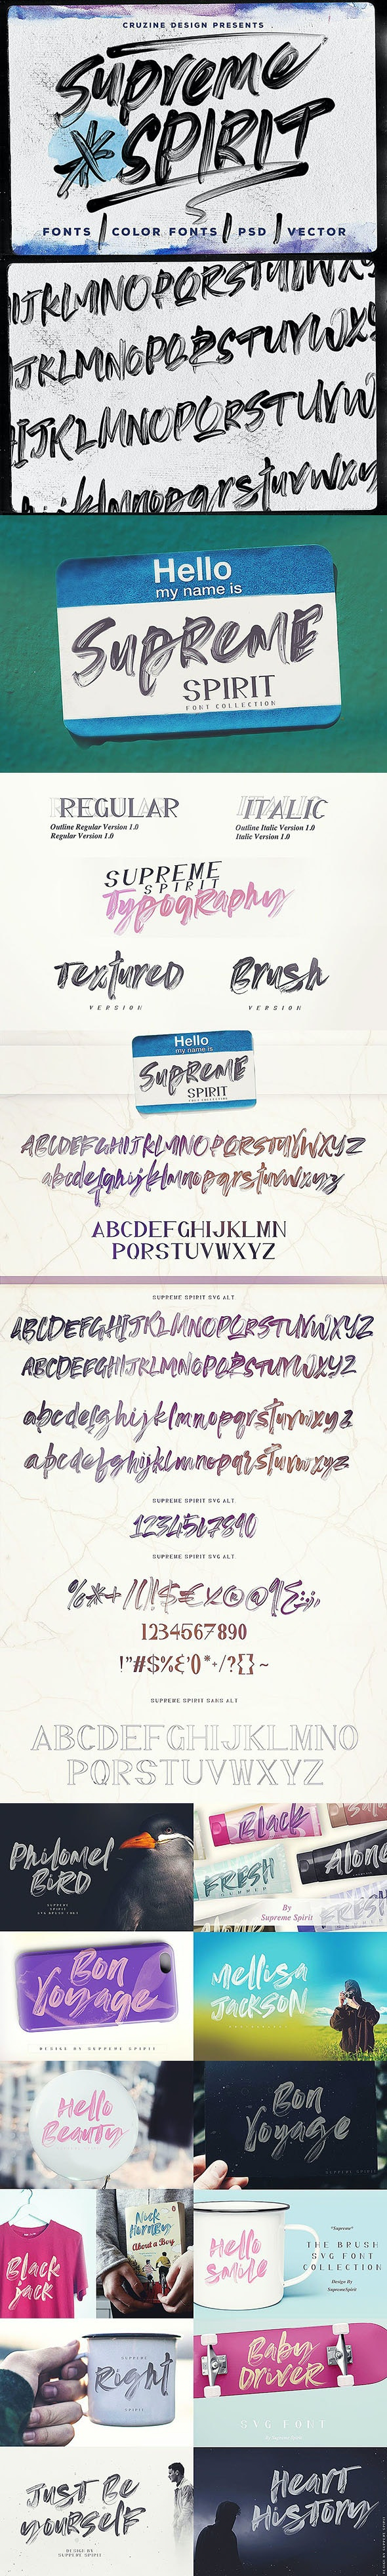 Supreme Spirit Brush Font - Miscellaneous Script